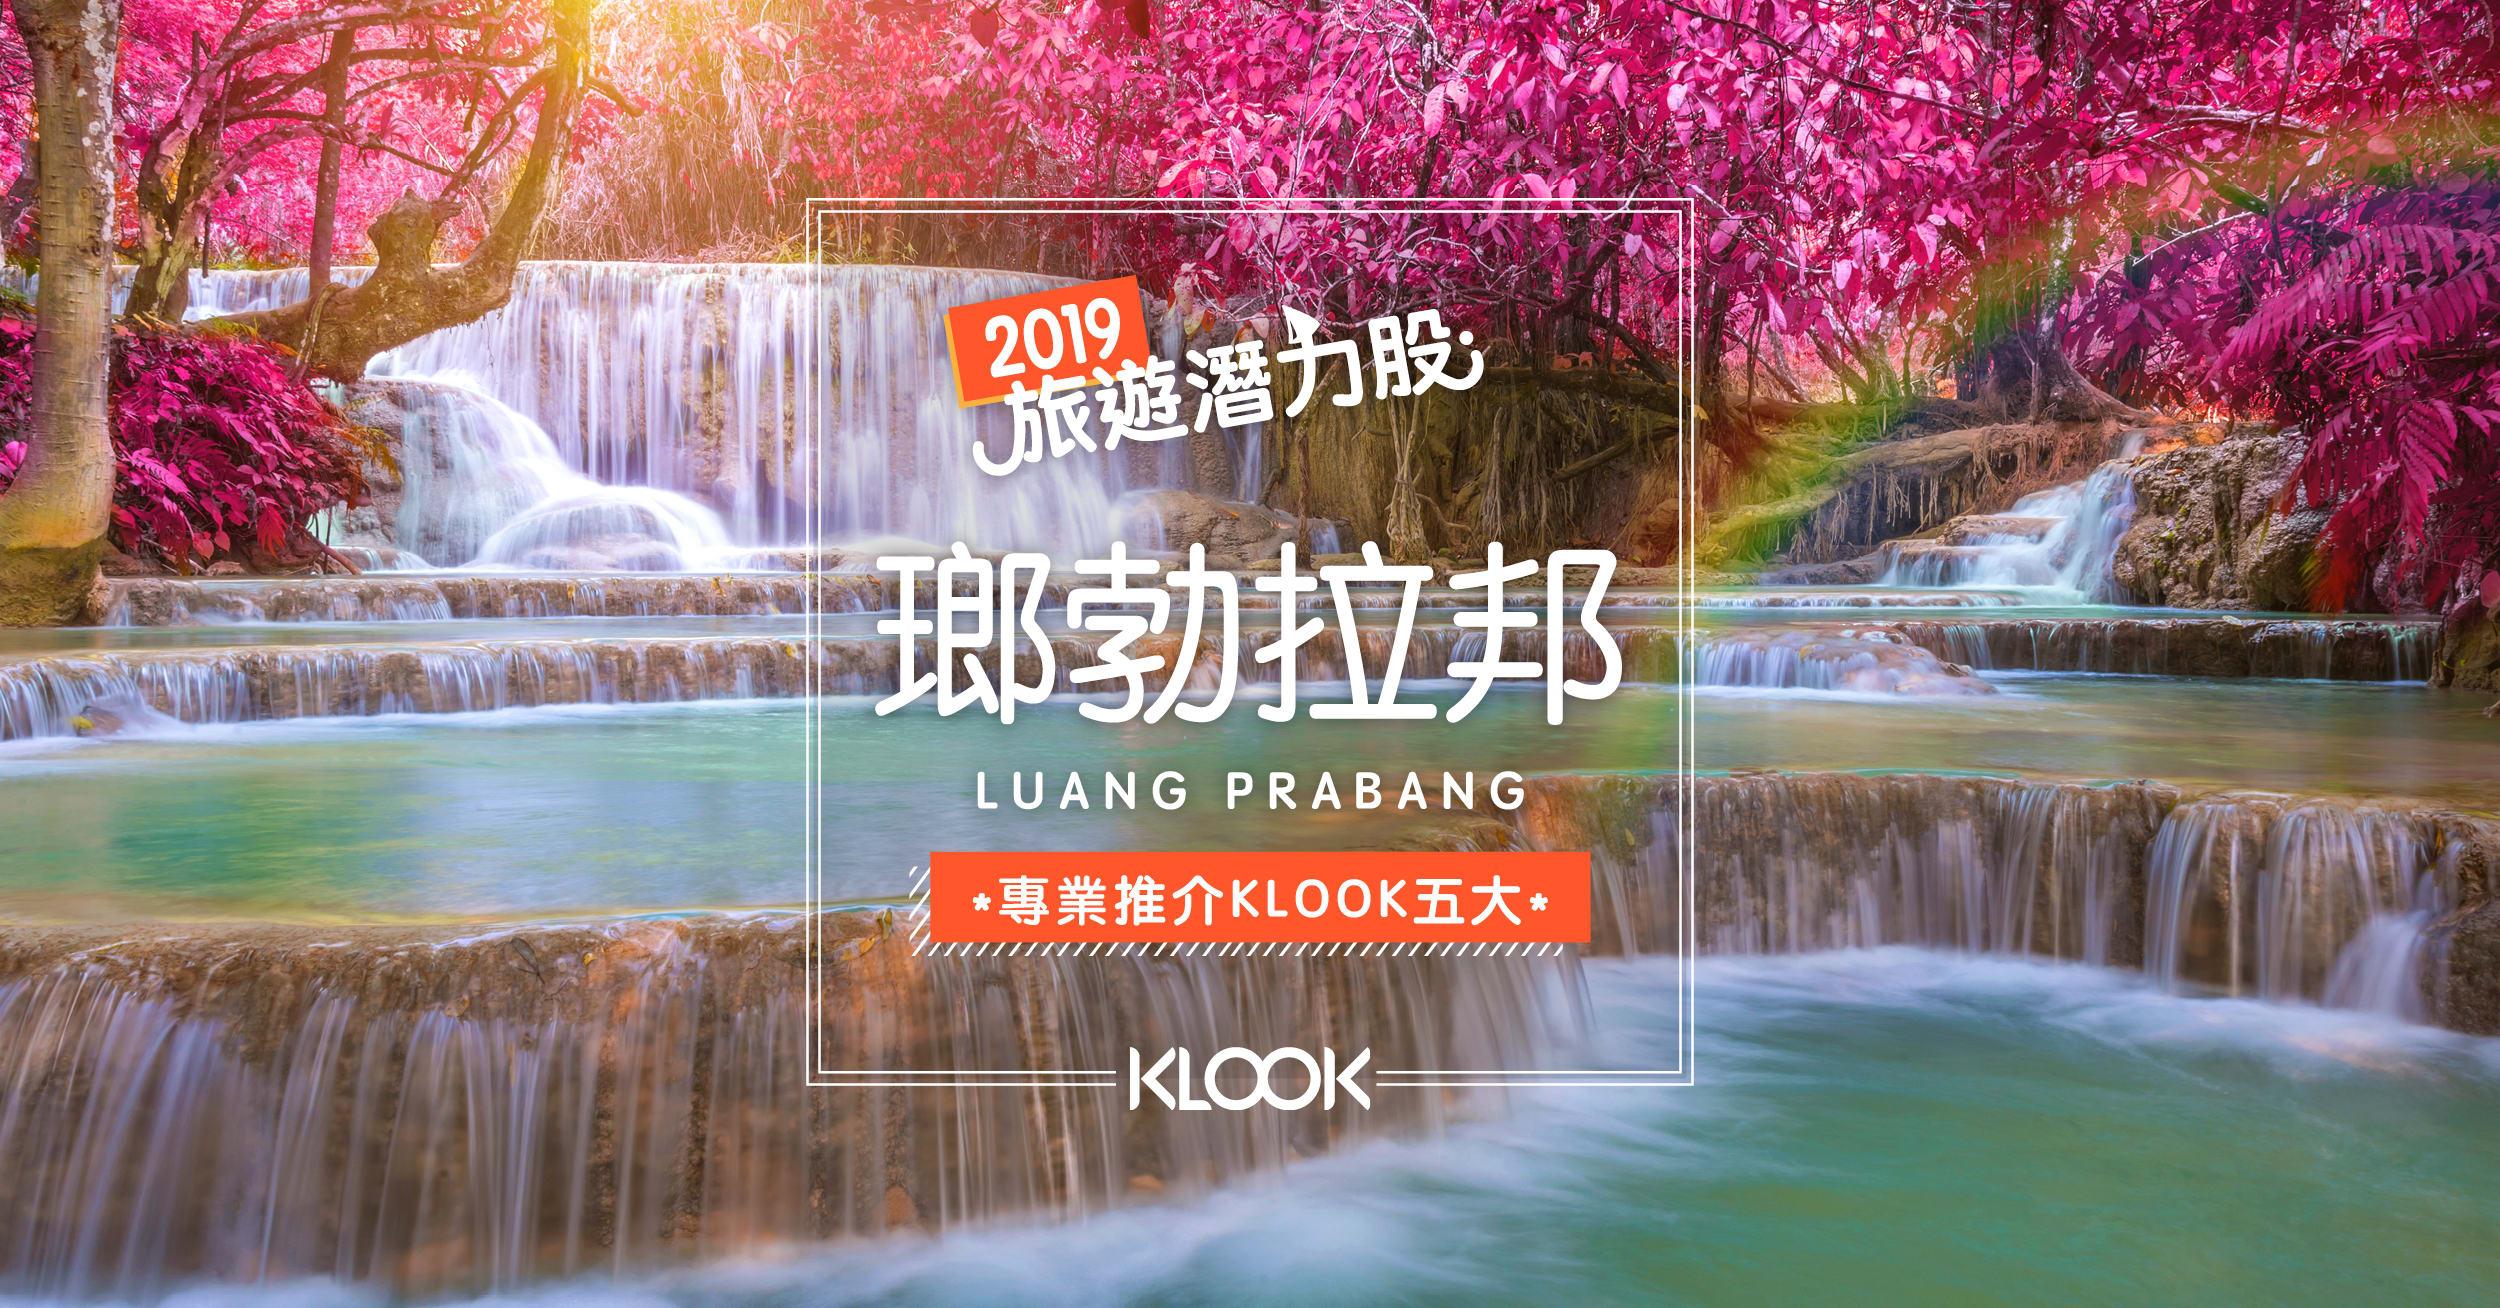 190103 CNY 2019 travel sug blog8